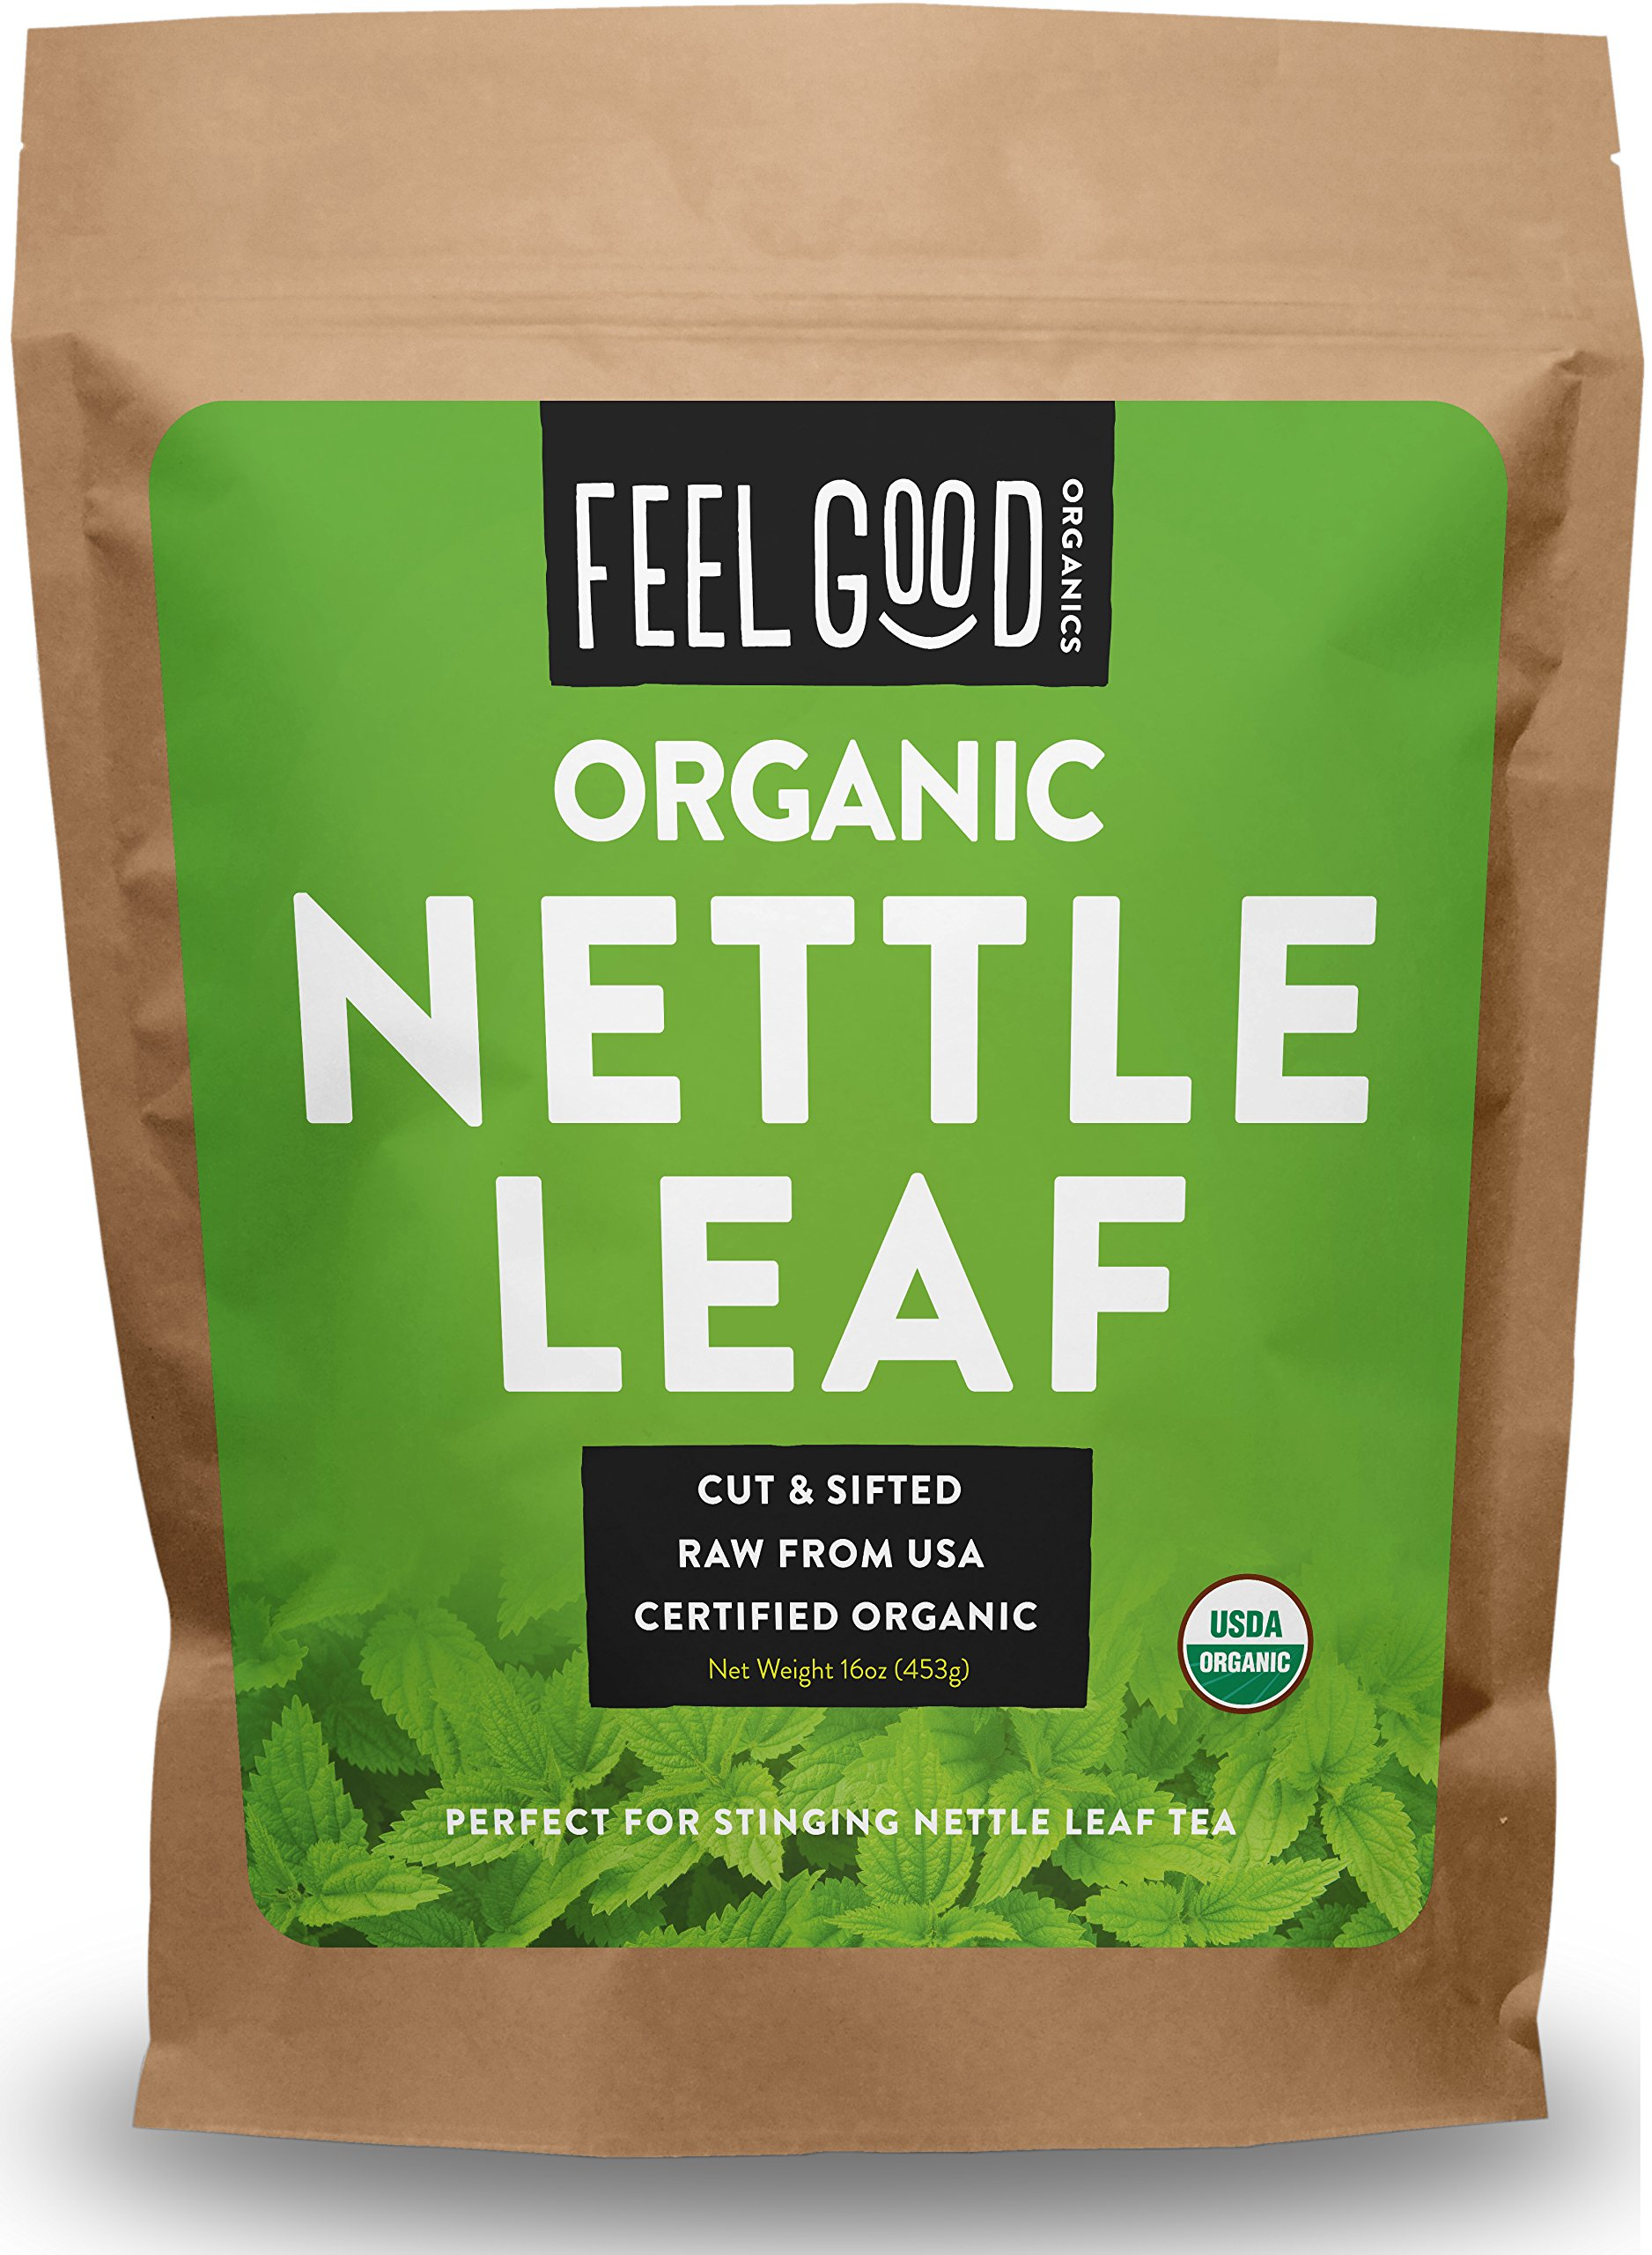 Organic Nettle Leaf - Cut & Sifted - 16oz Resealable Bag - 100% Raw From U.S.A. - by Feel Good Organics